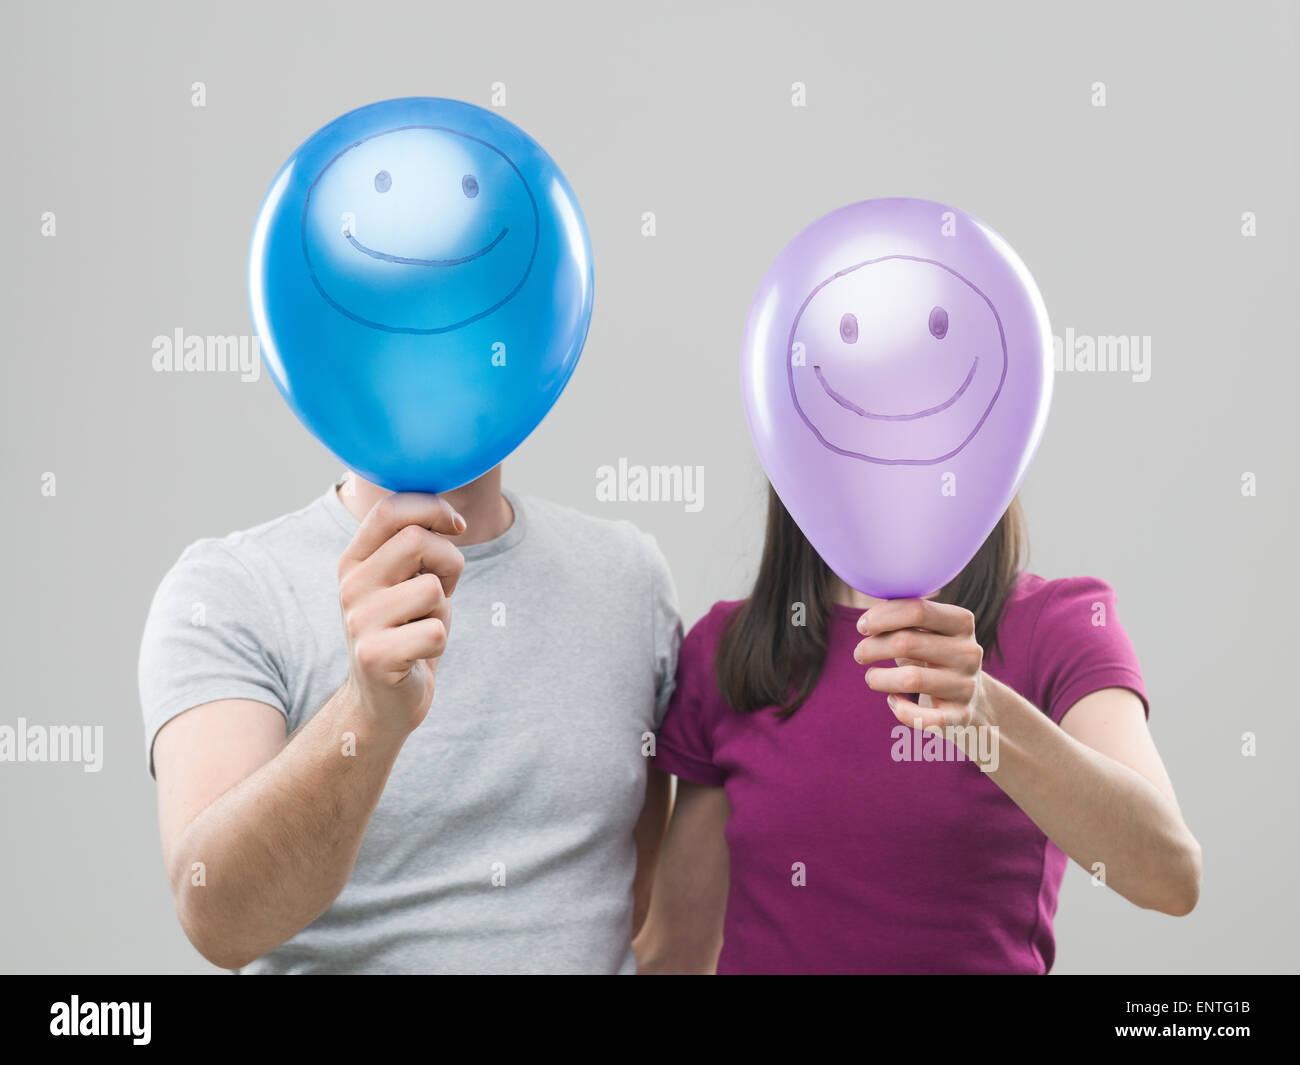 Par ocultar sus cabezas detrás de globos de colores con caras sonrientes, contra un fondo gris Imagen De Stock